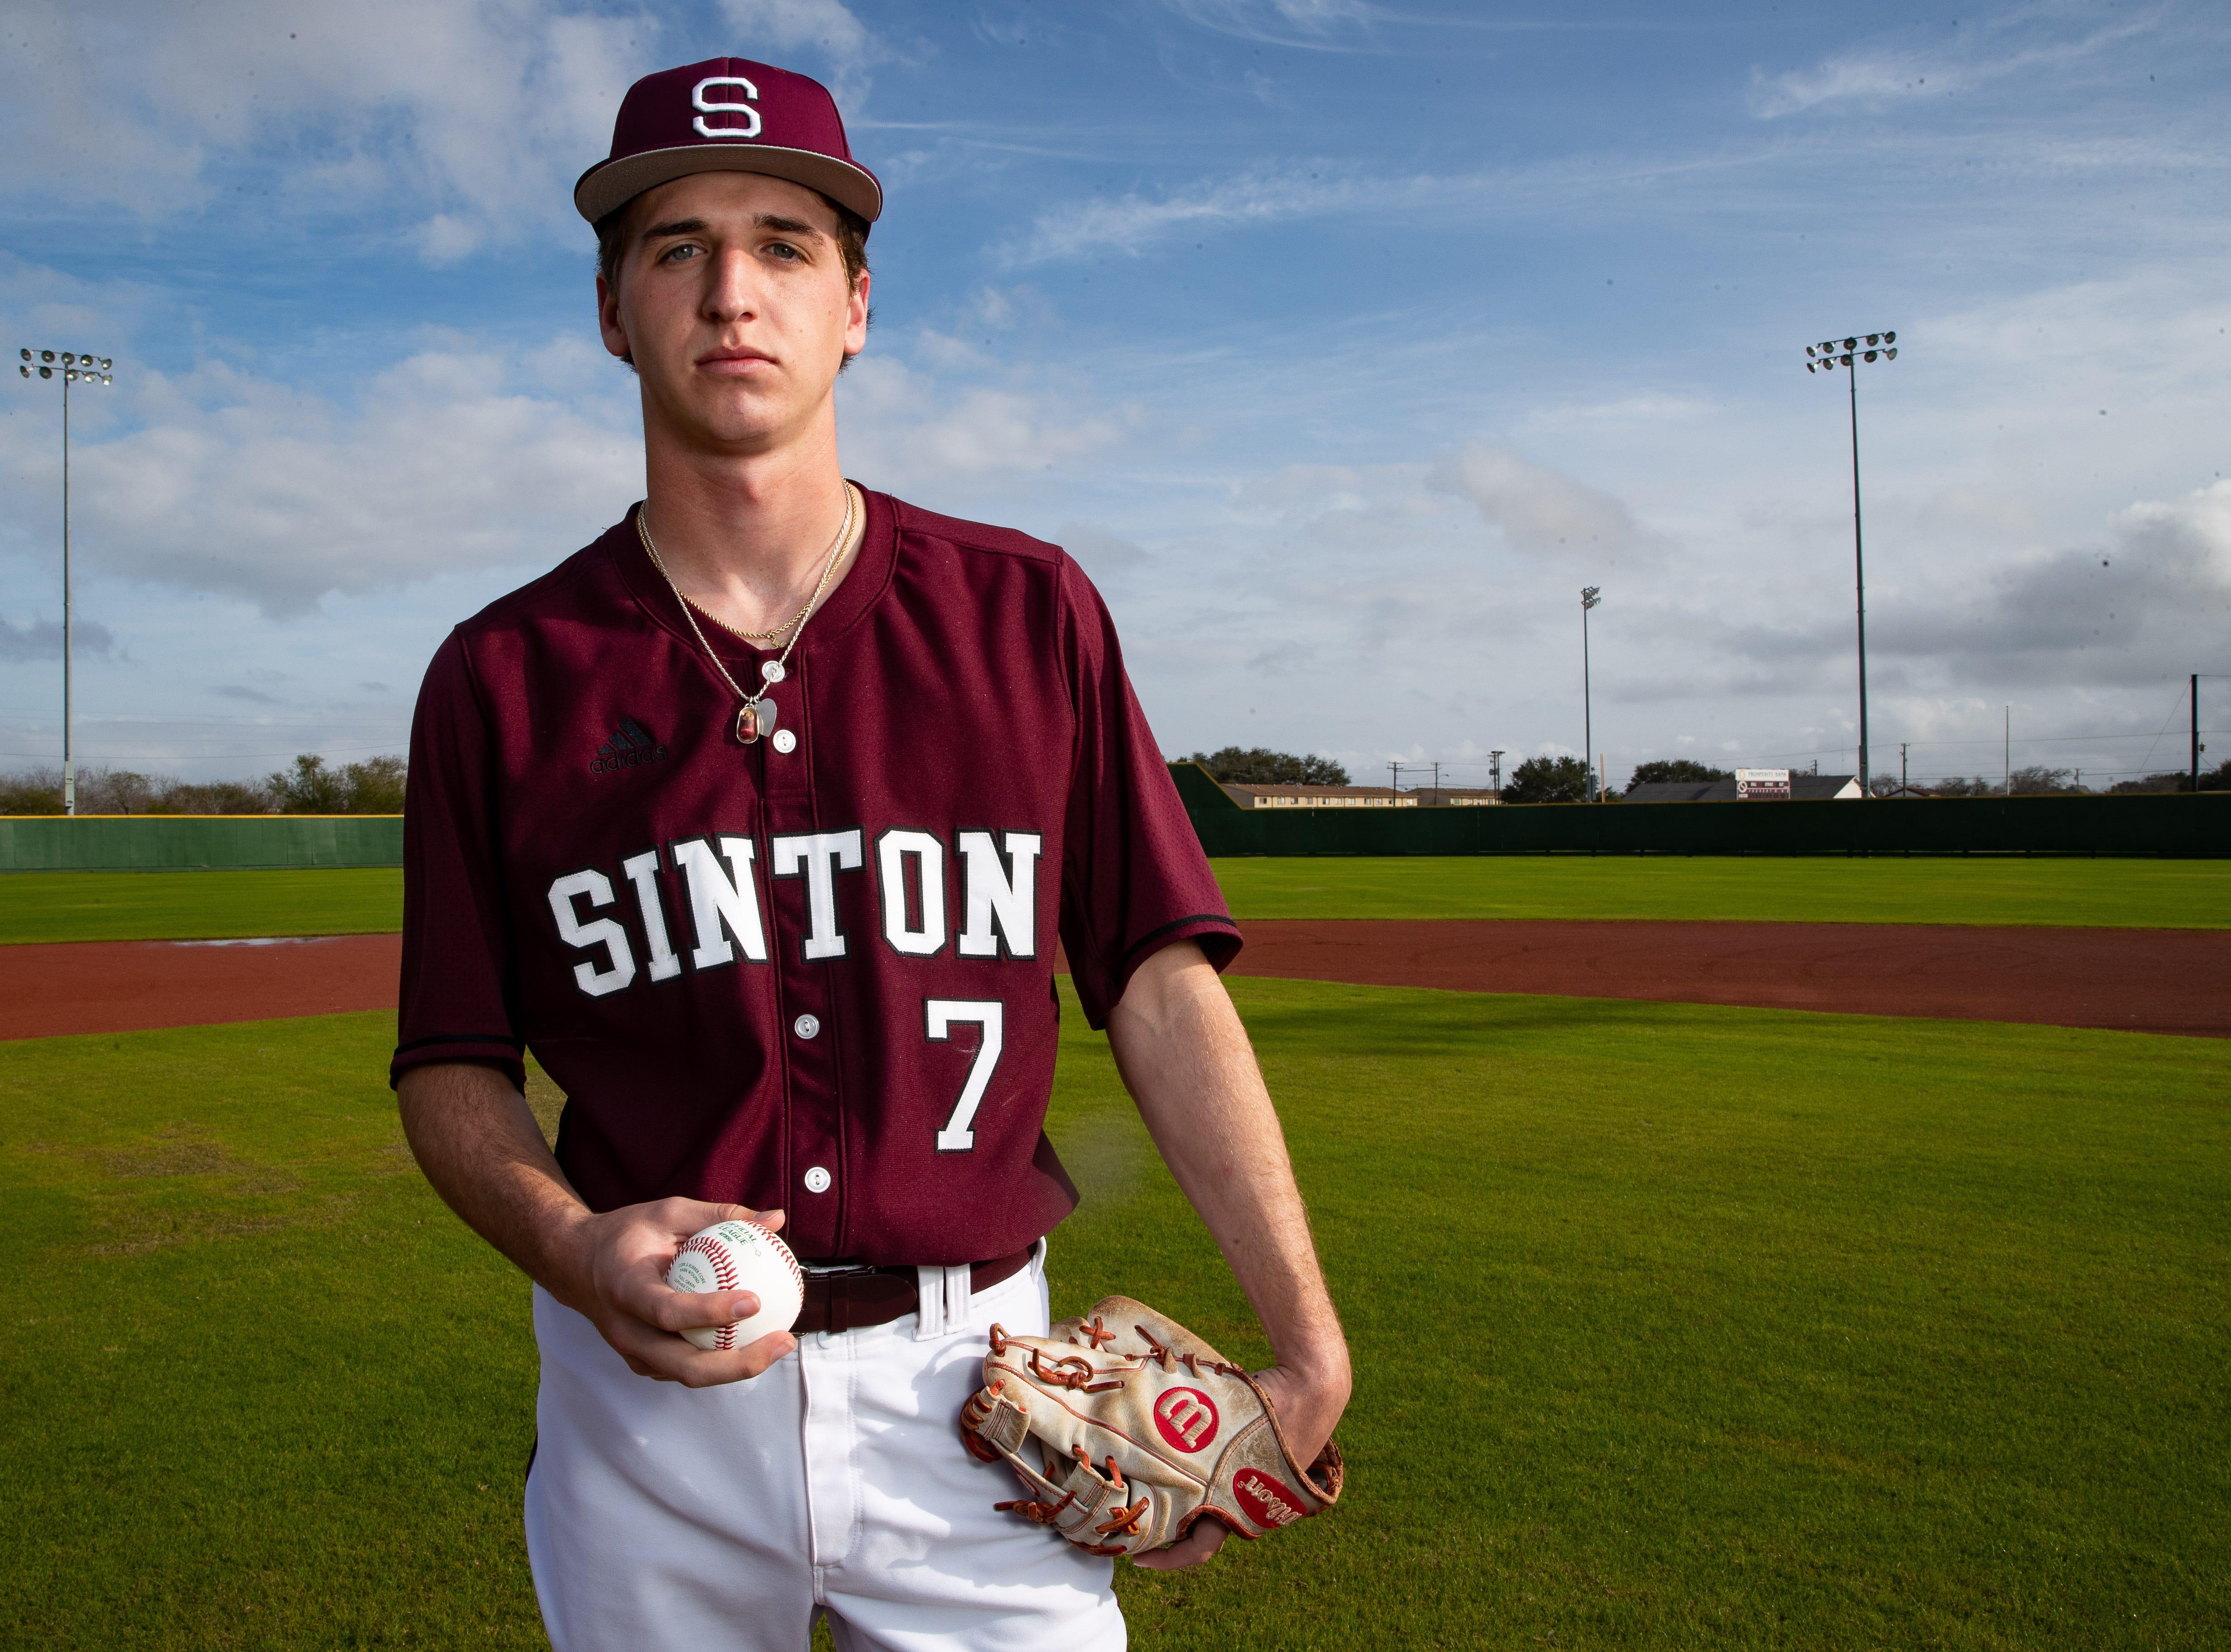 Sinton High School baseball pitcher Brett Brown poses for a portrait.